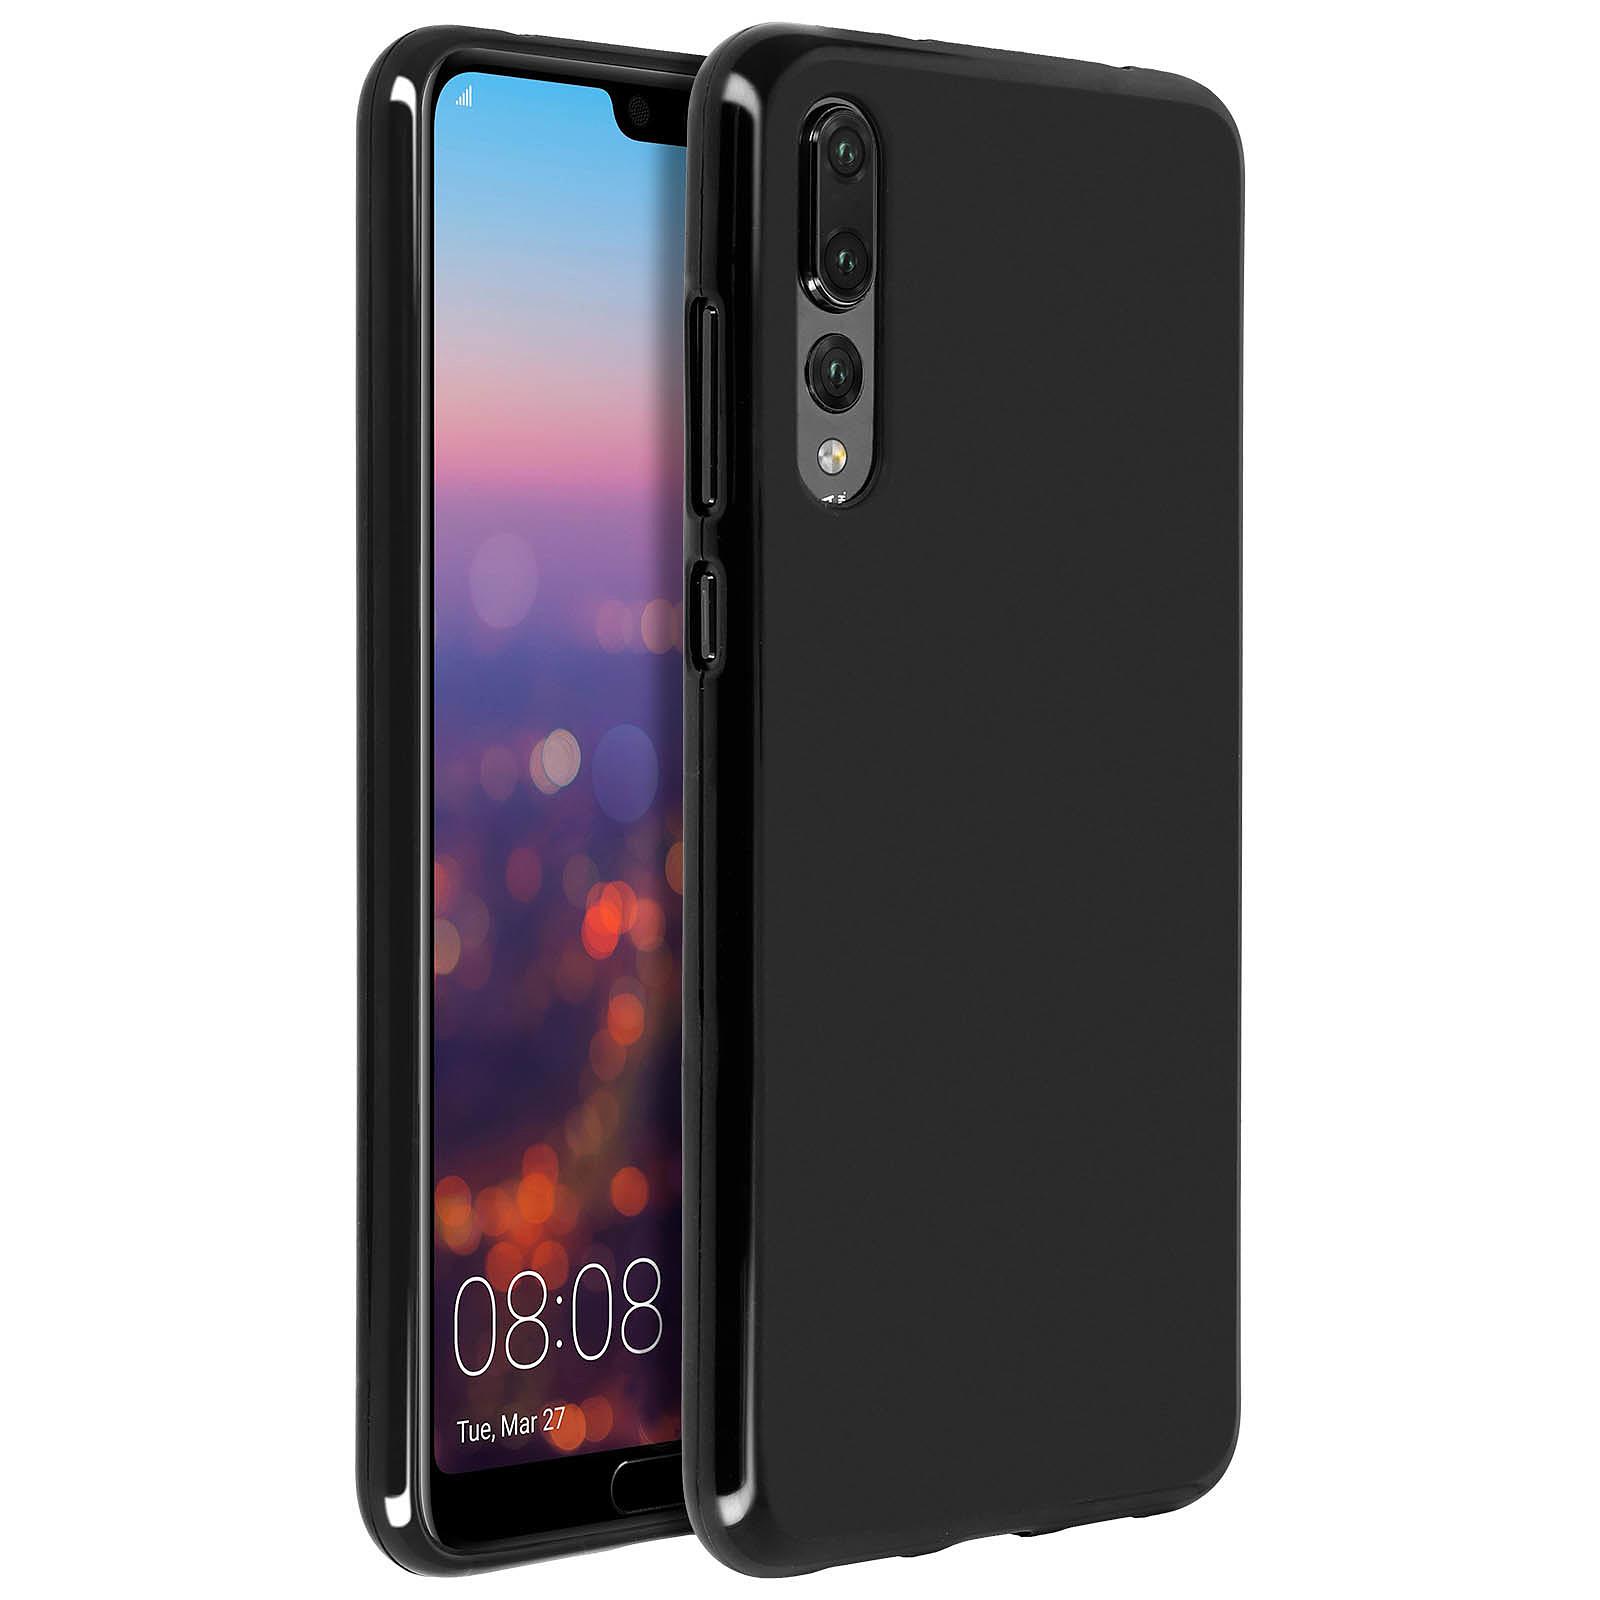 Avizar Coque Noir pour Huawei P20 Pro